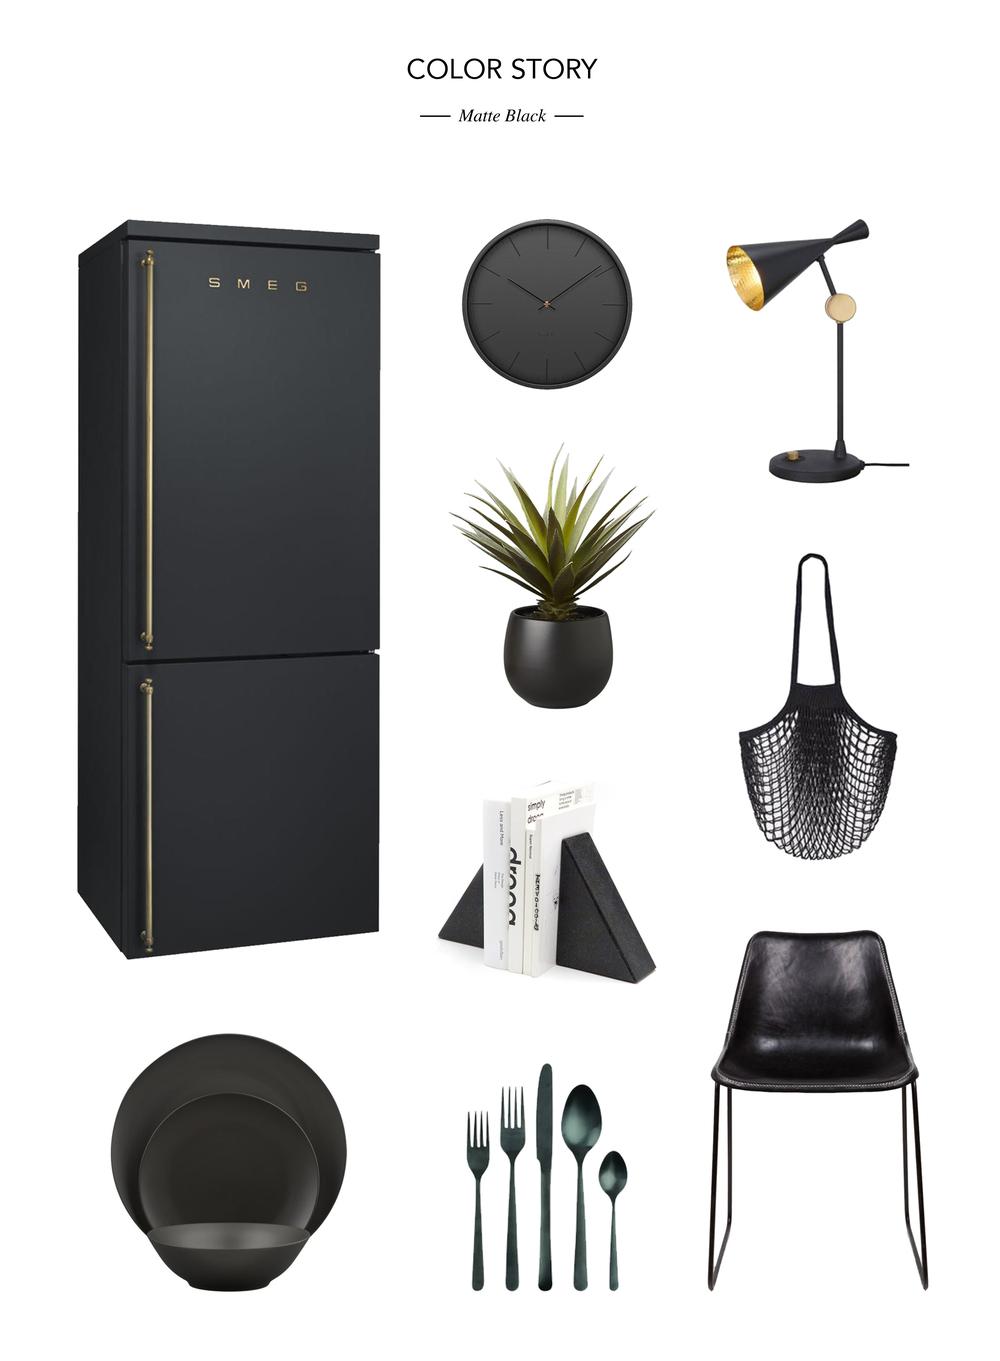 Fridge  //  Serveware  //  Clock  //  Planter  // Bookends  //  Cutlery  //  Lamp  //  Bag  //  Chair